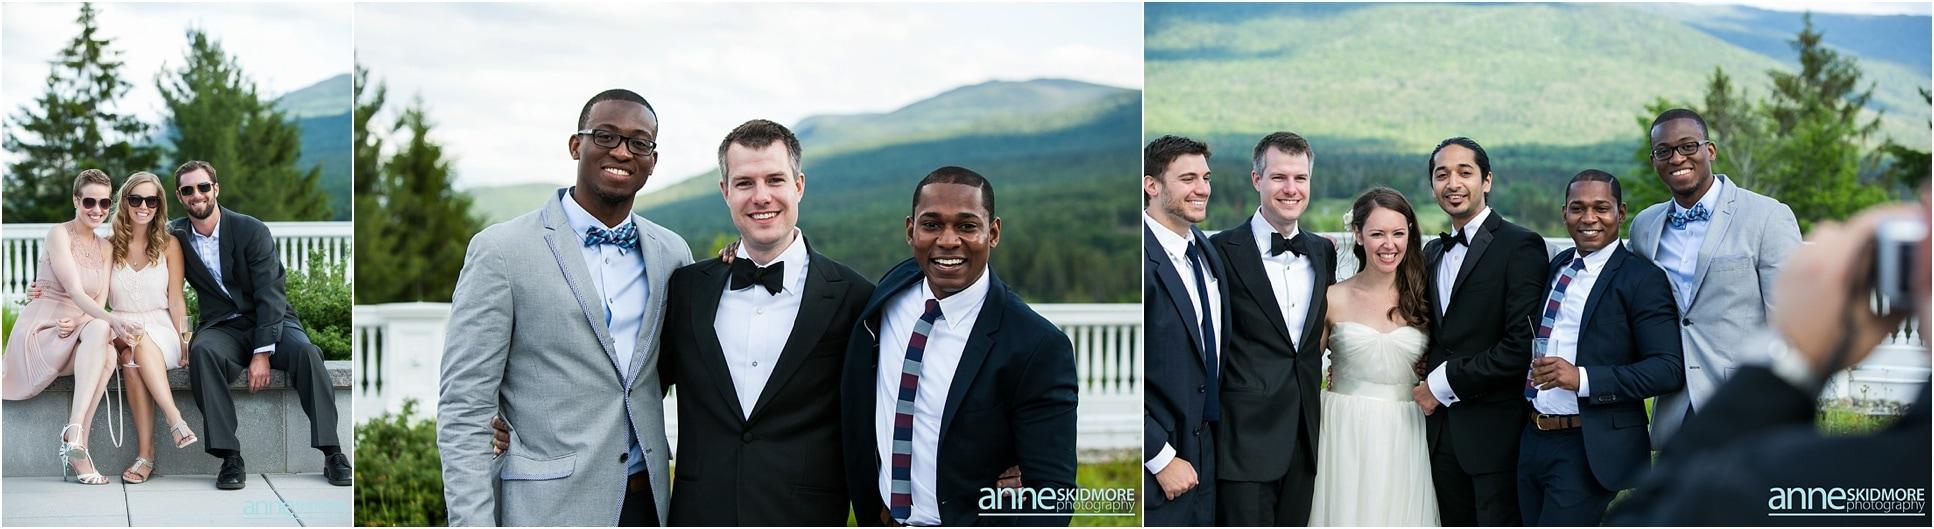 Omni_Mount_Washington_Wedding_0035